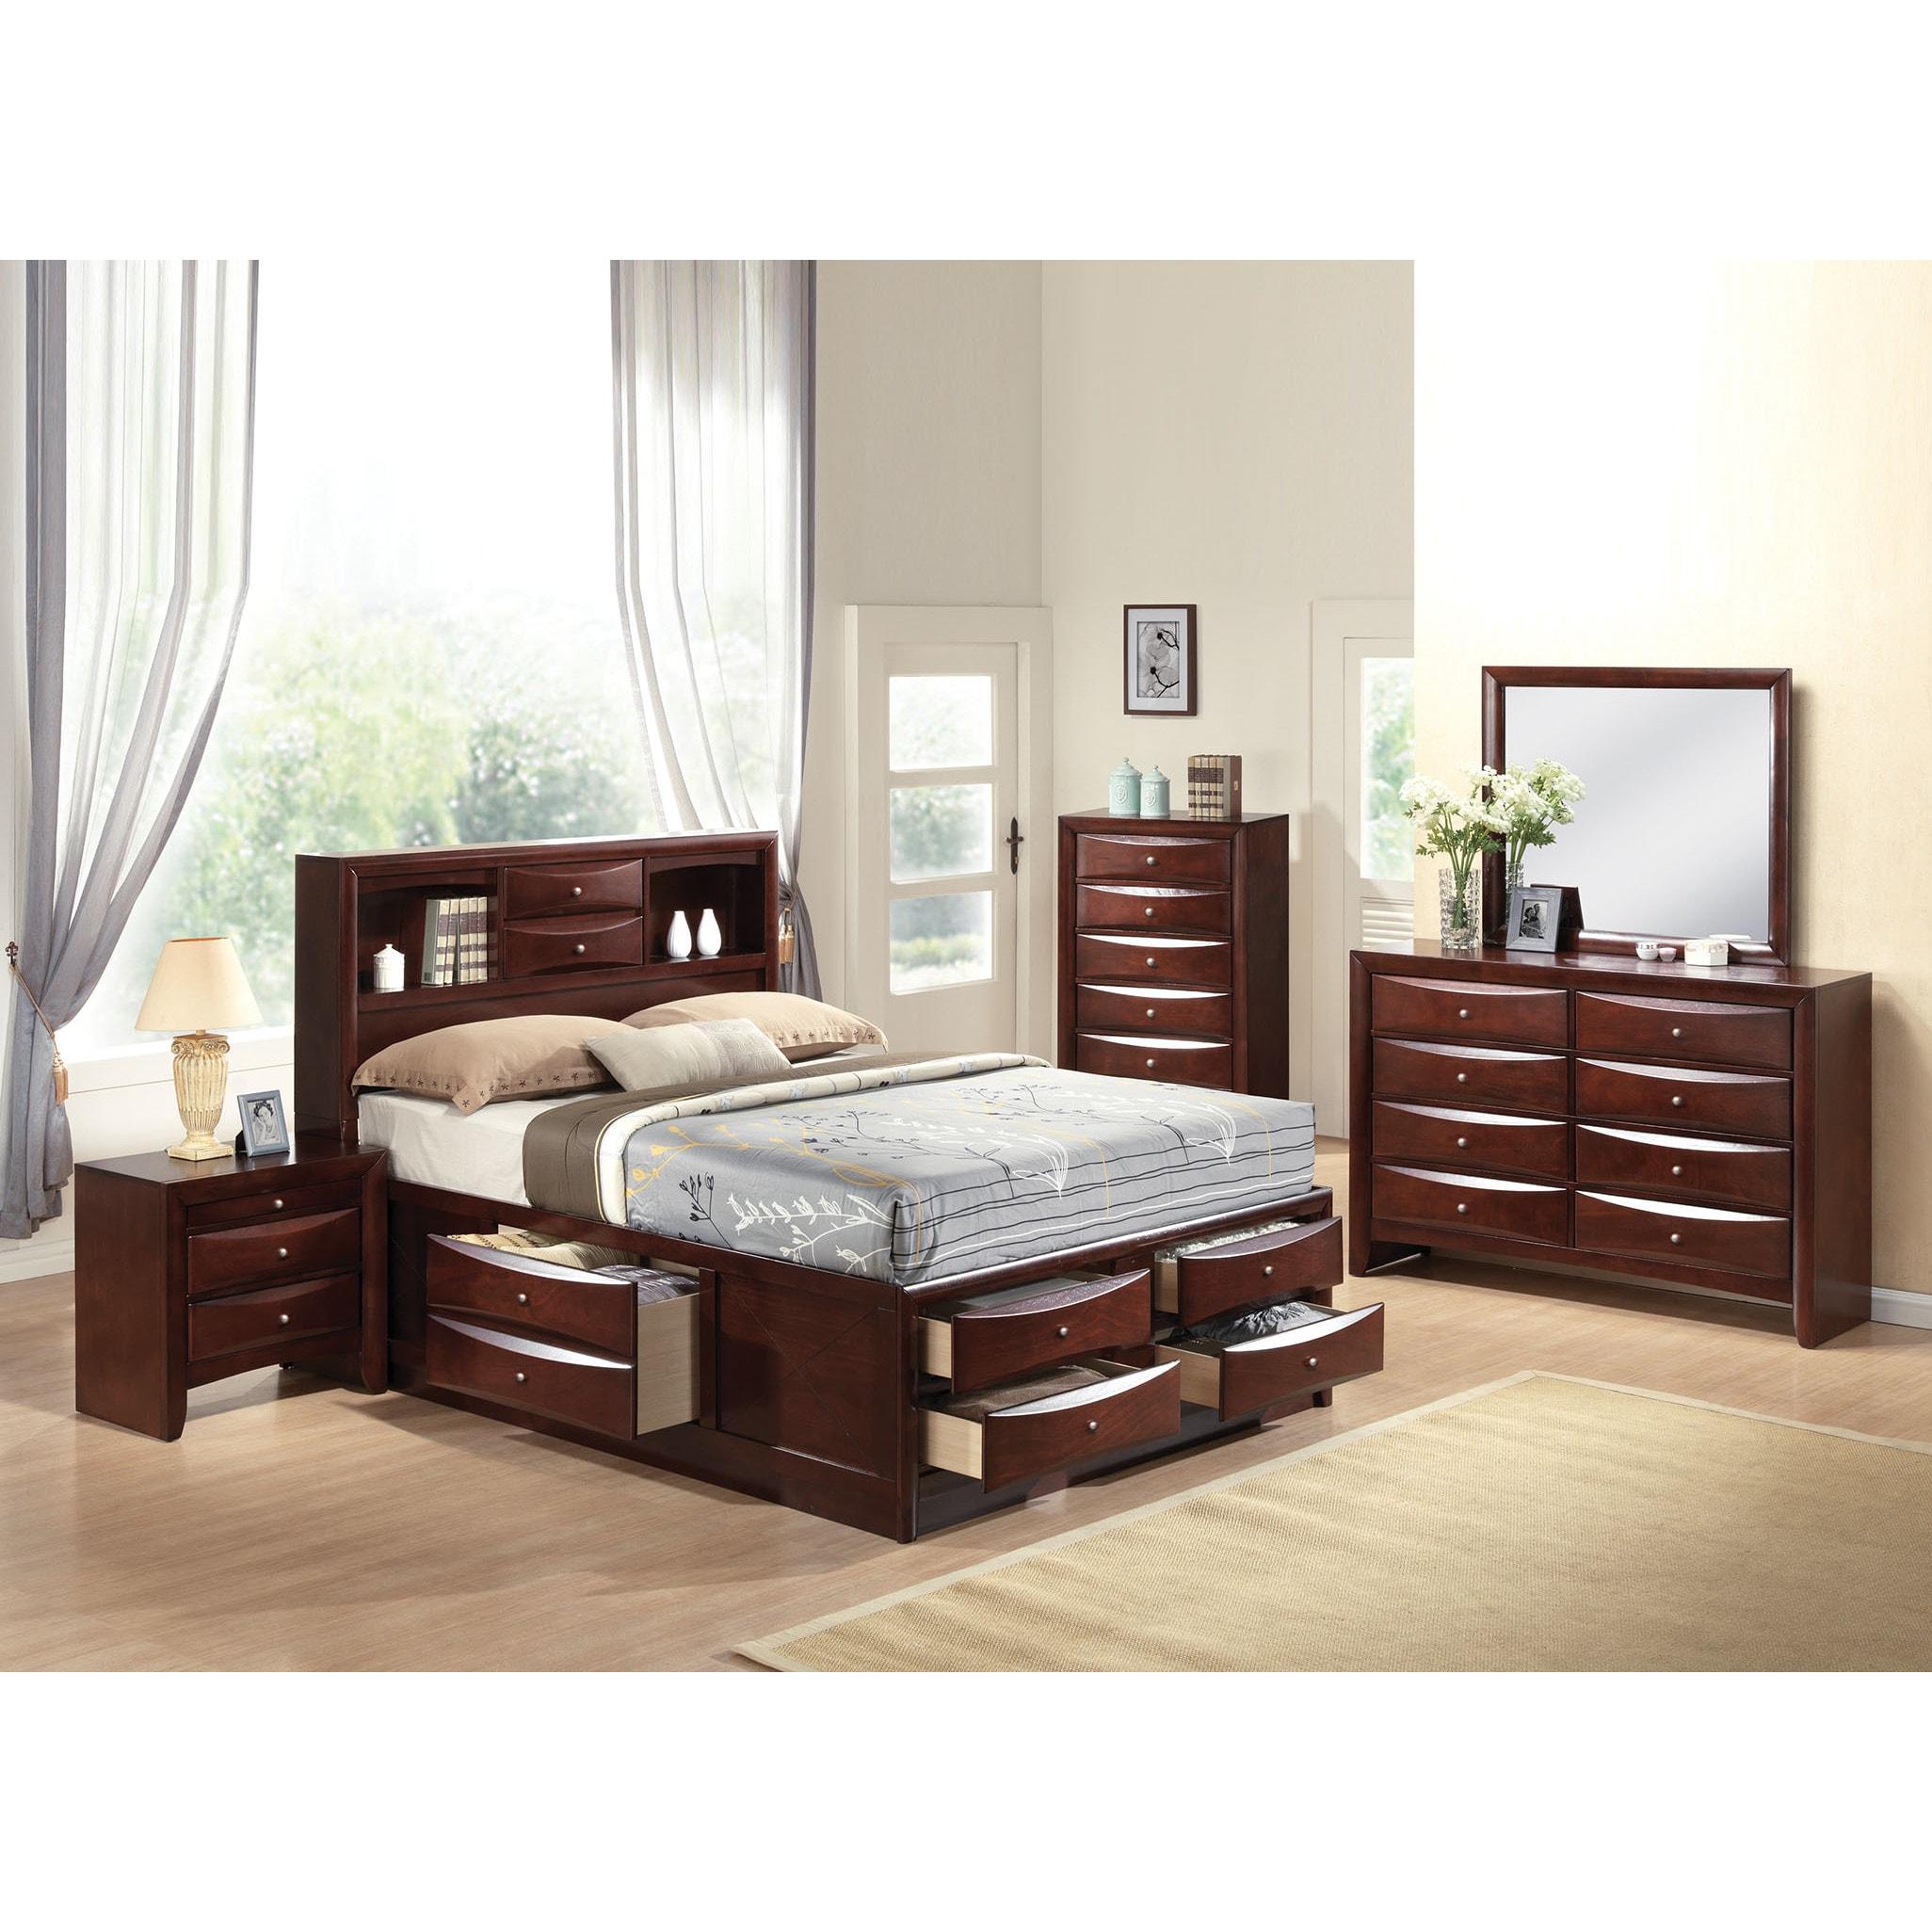 Shop ireland espresso 4 piece storage bedroom set free shipping today overstock com 12271241